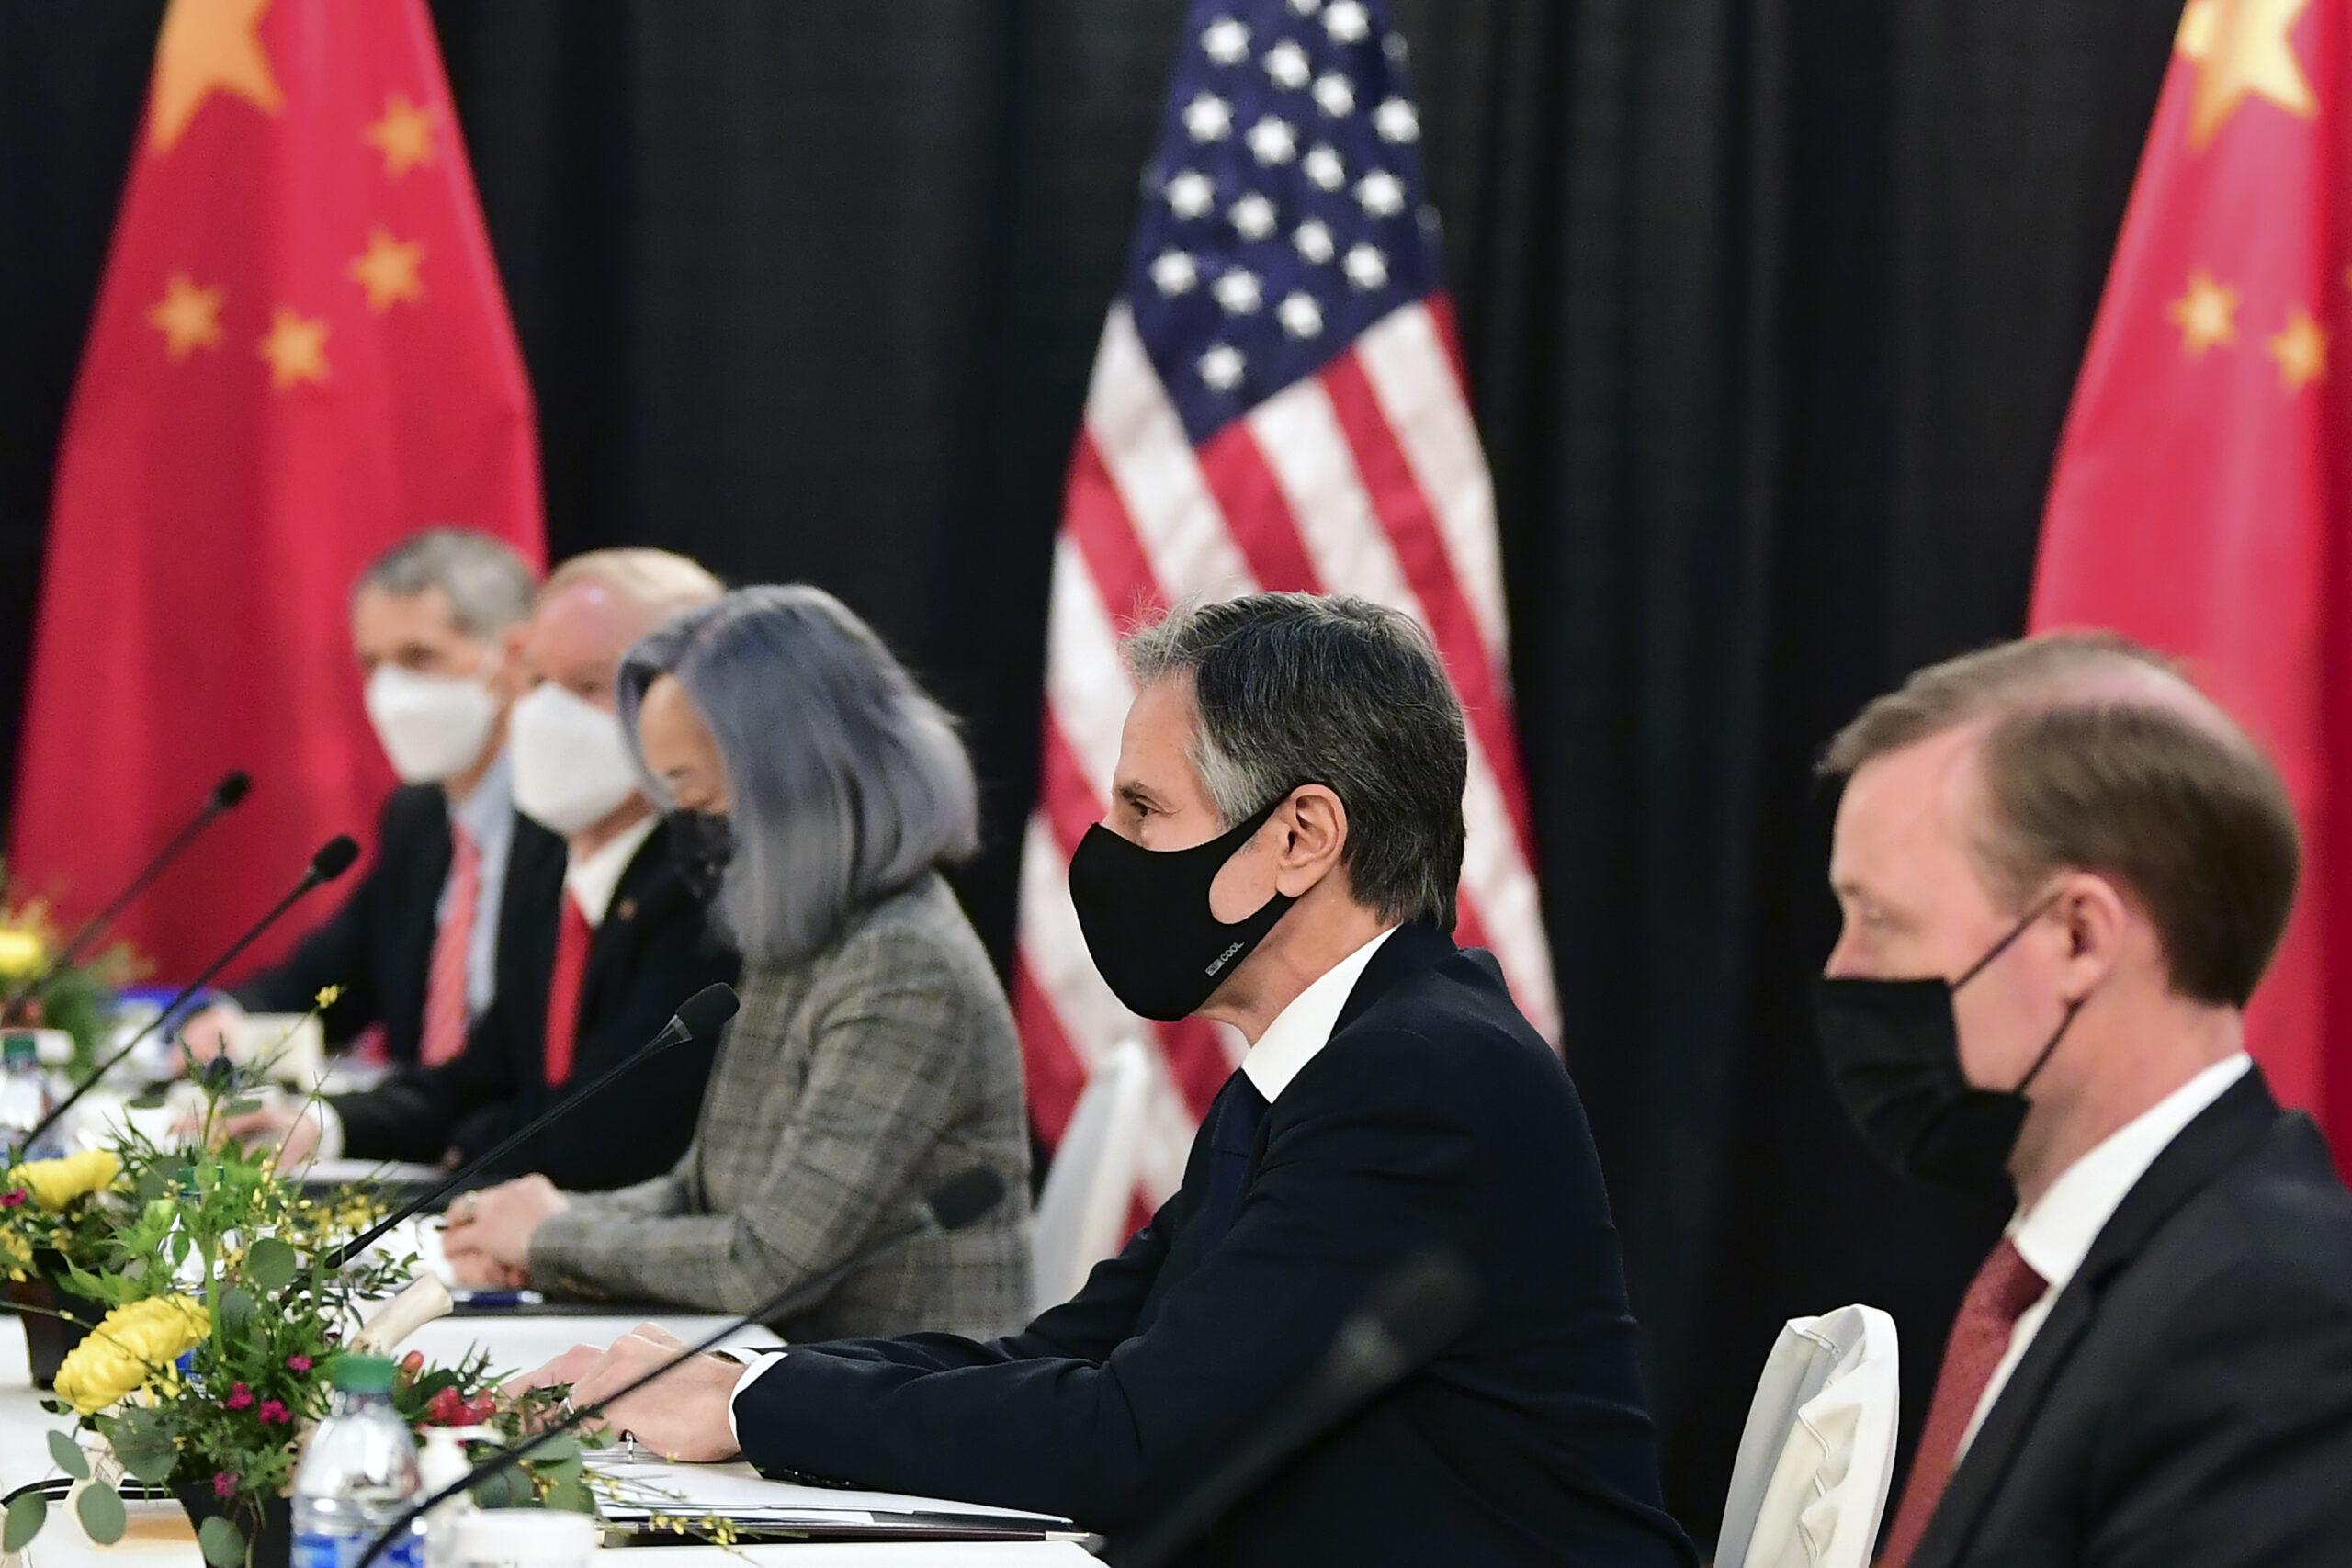 So Washington lends its side to China